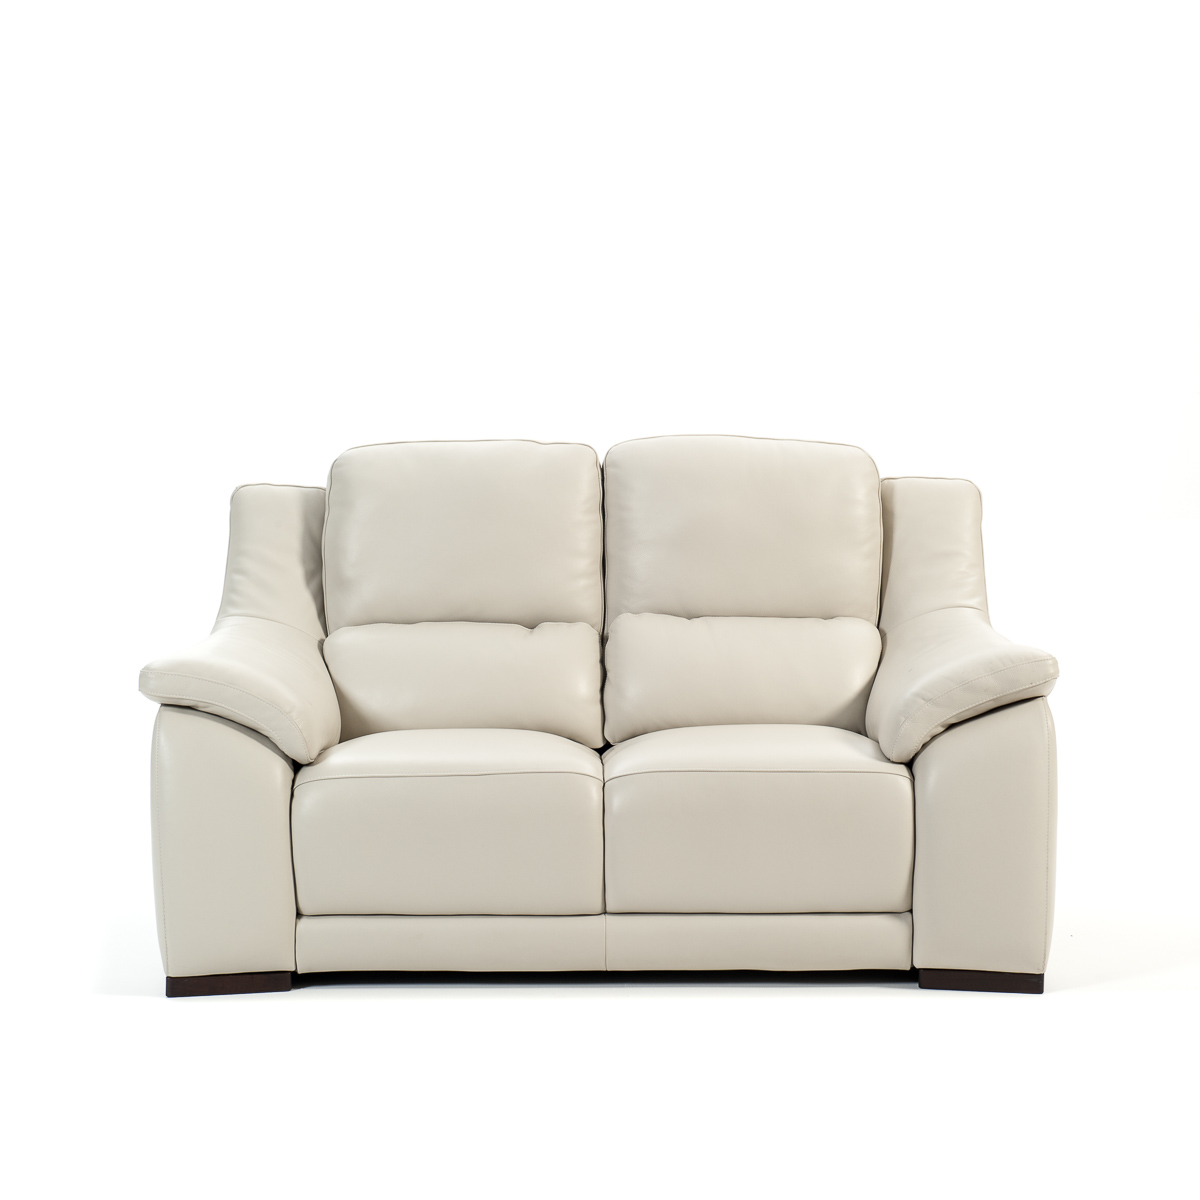 Livorno 2 Seater Sofa